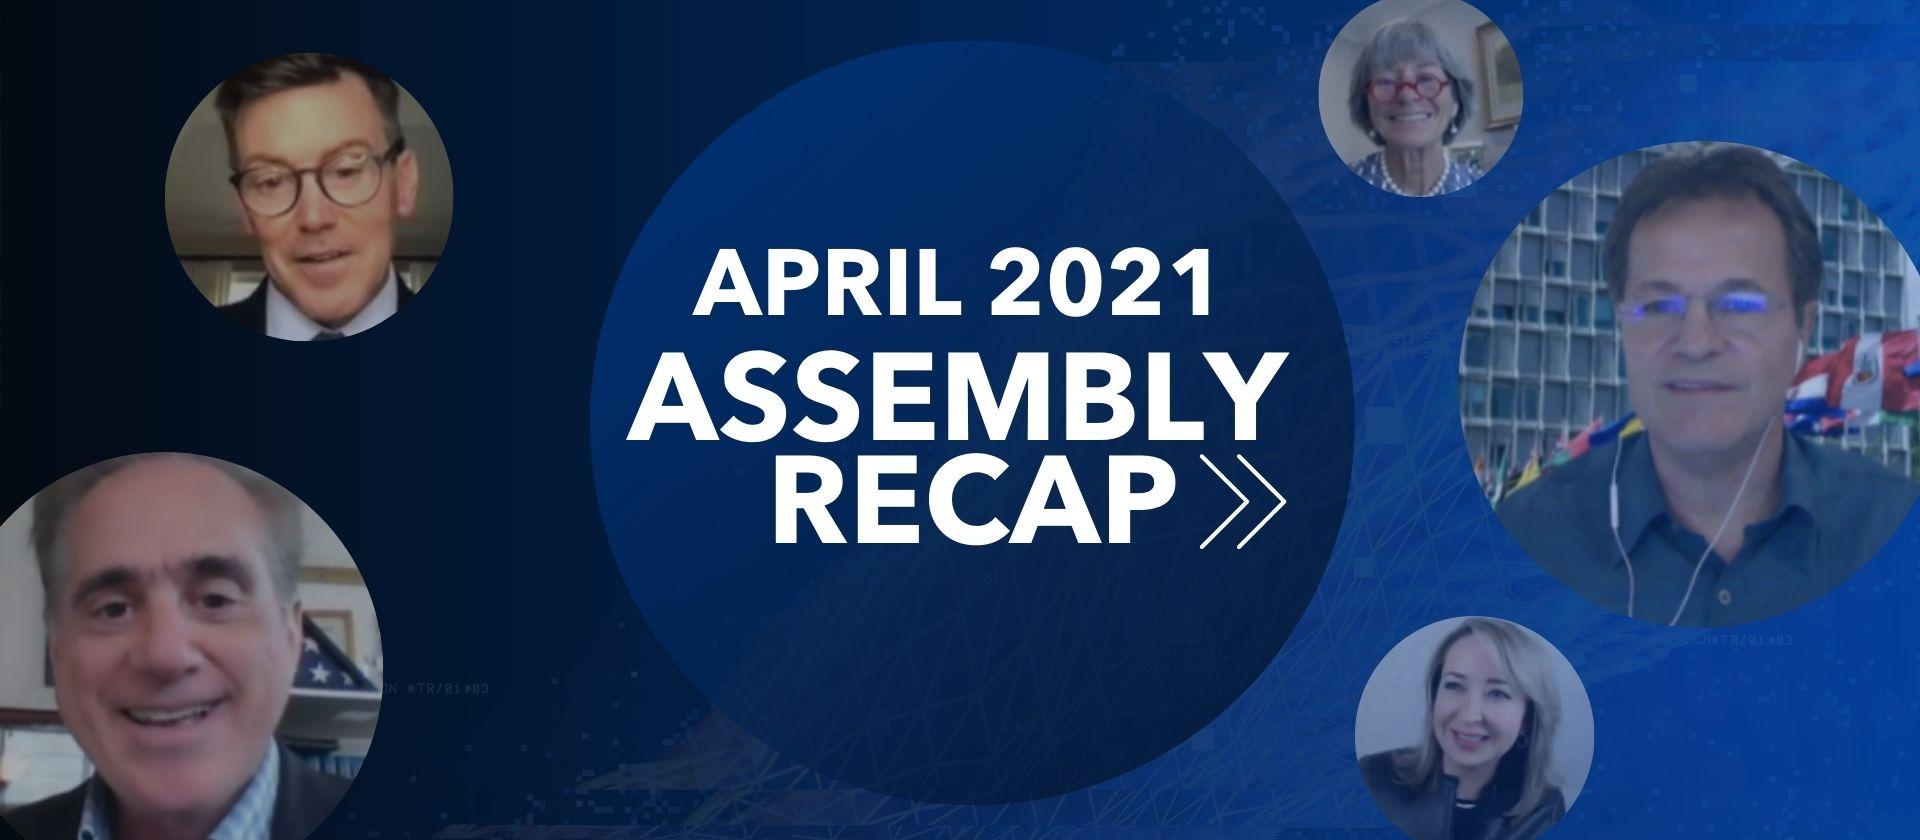 Your April Assembly Recap